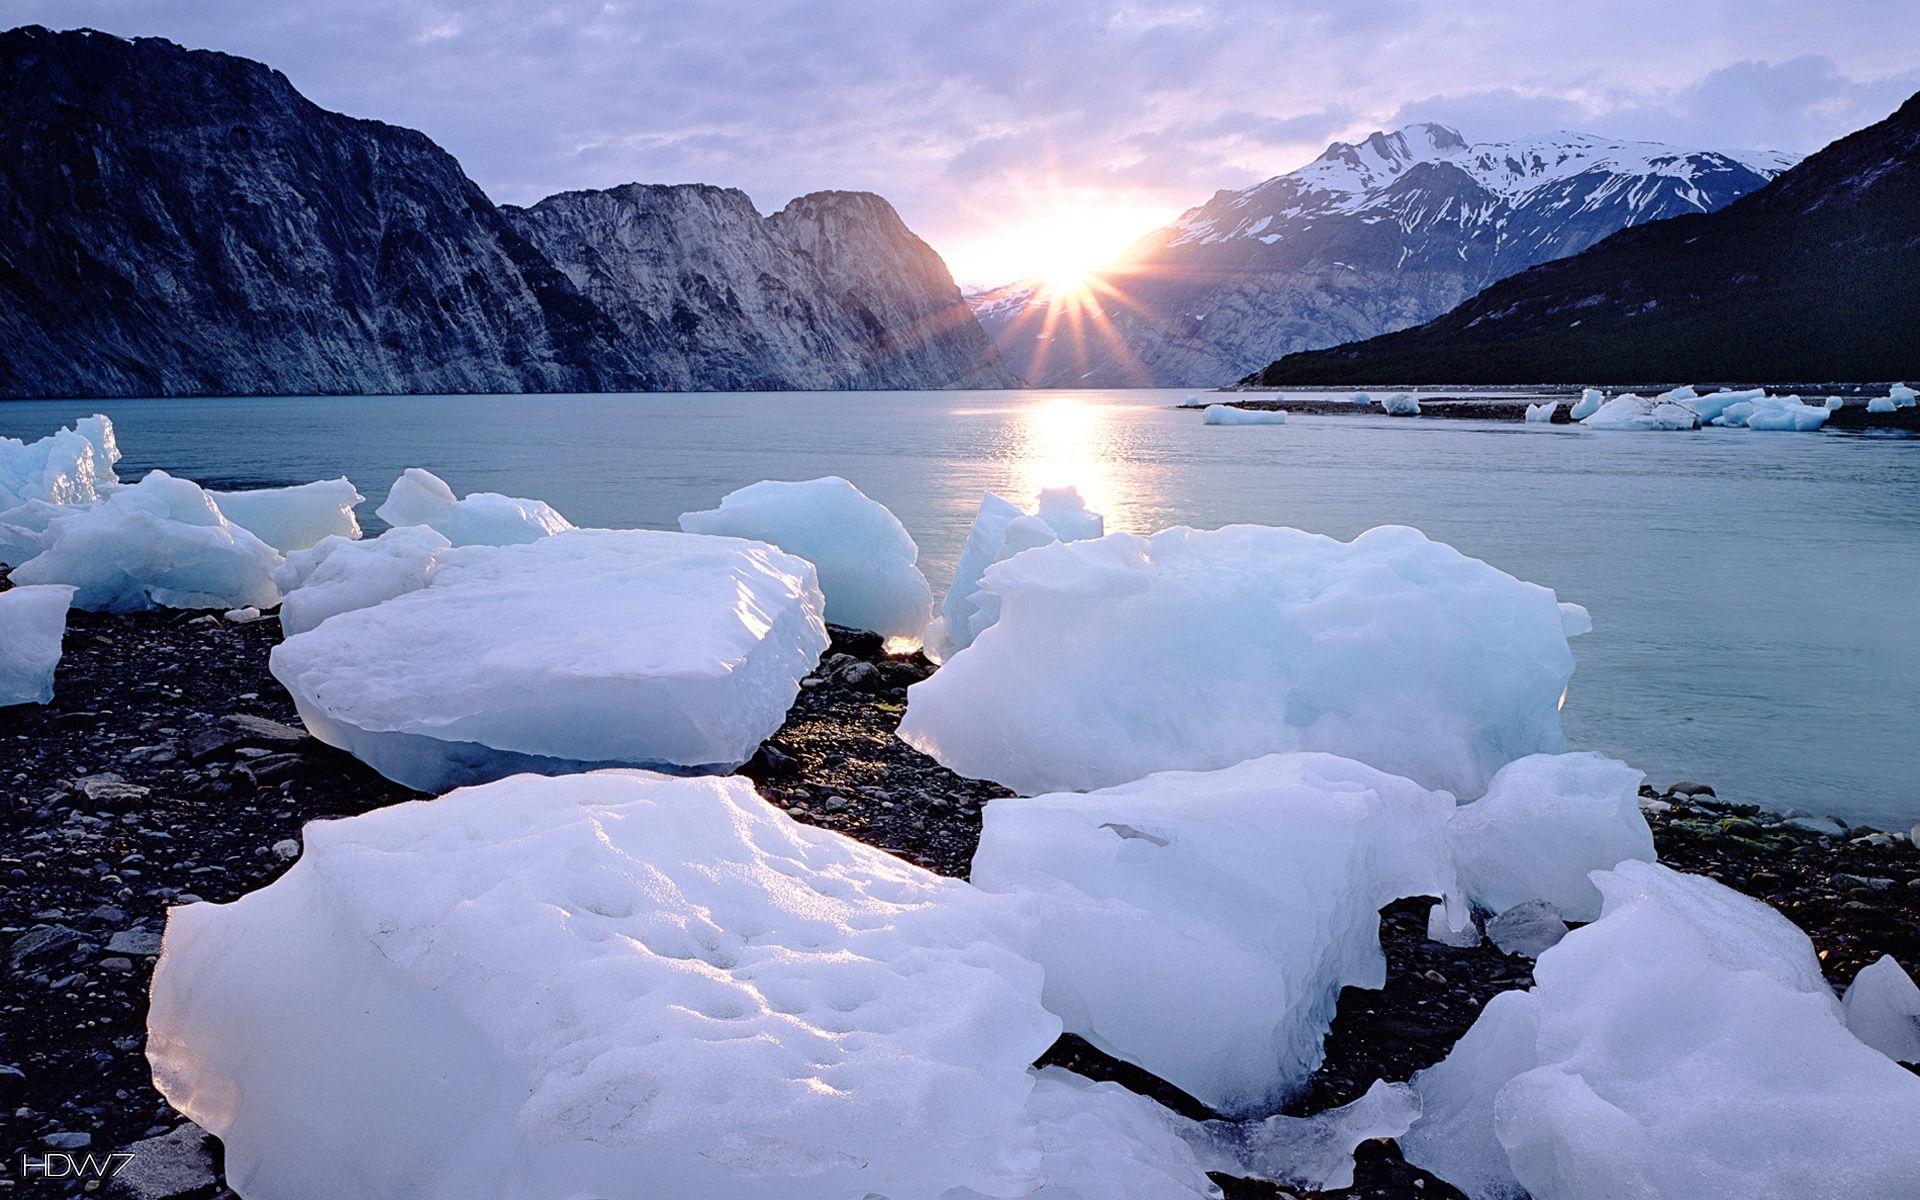 nature & landscape windows 7 winter hdtv wallpapers (desktop, phone